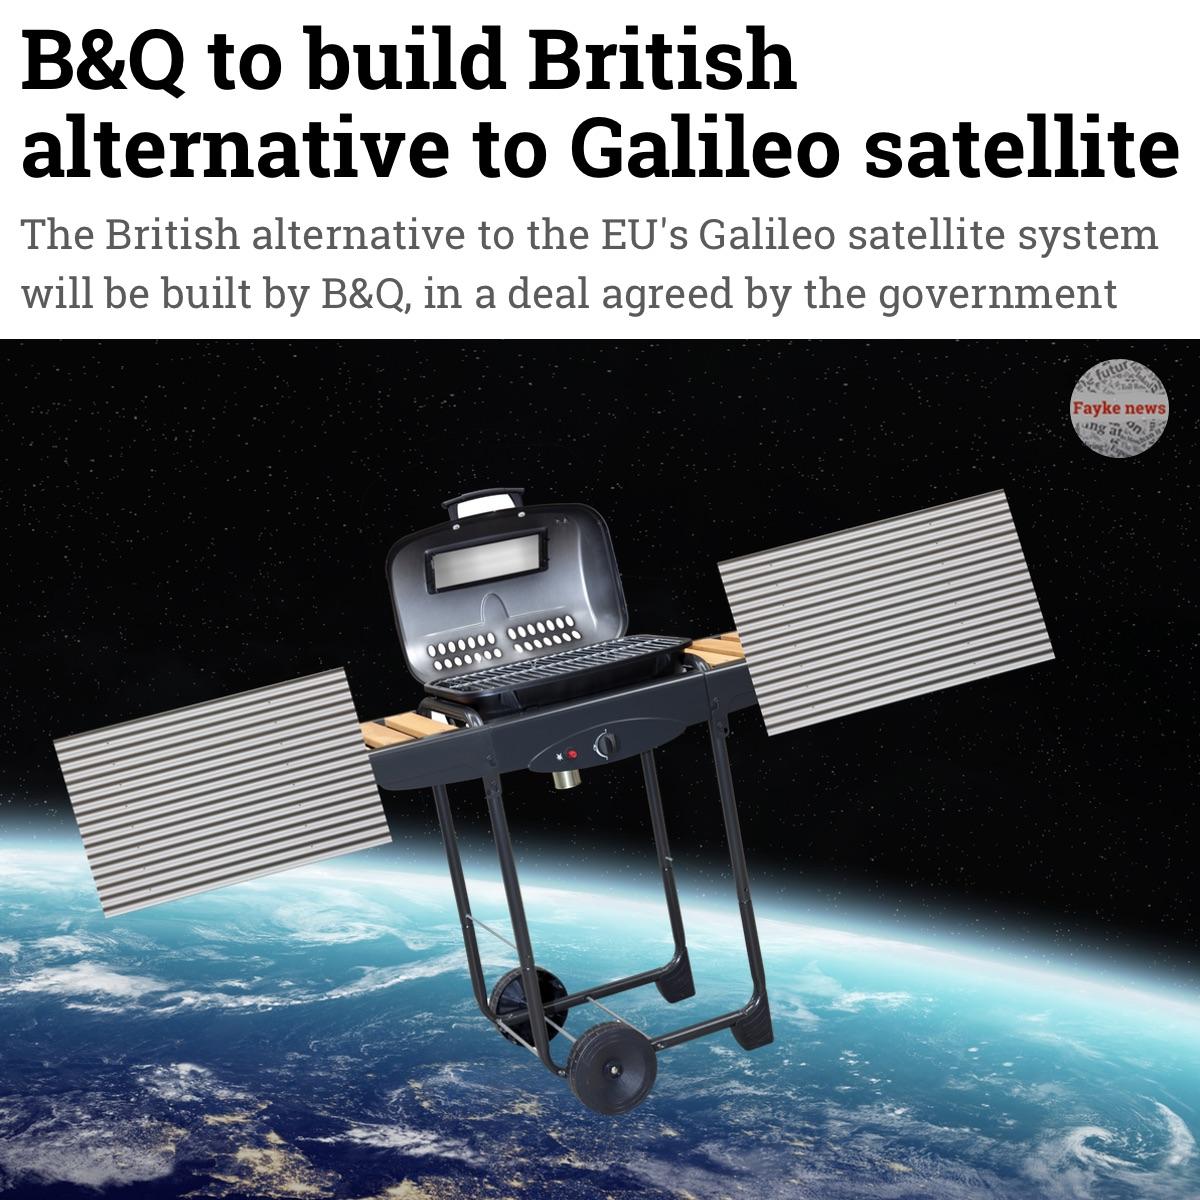 B Q Build Brexit Satellite Fake News Satire Meme Fayke News